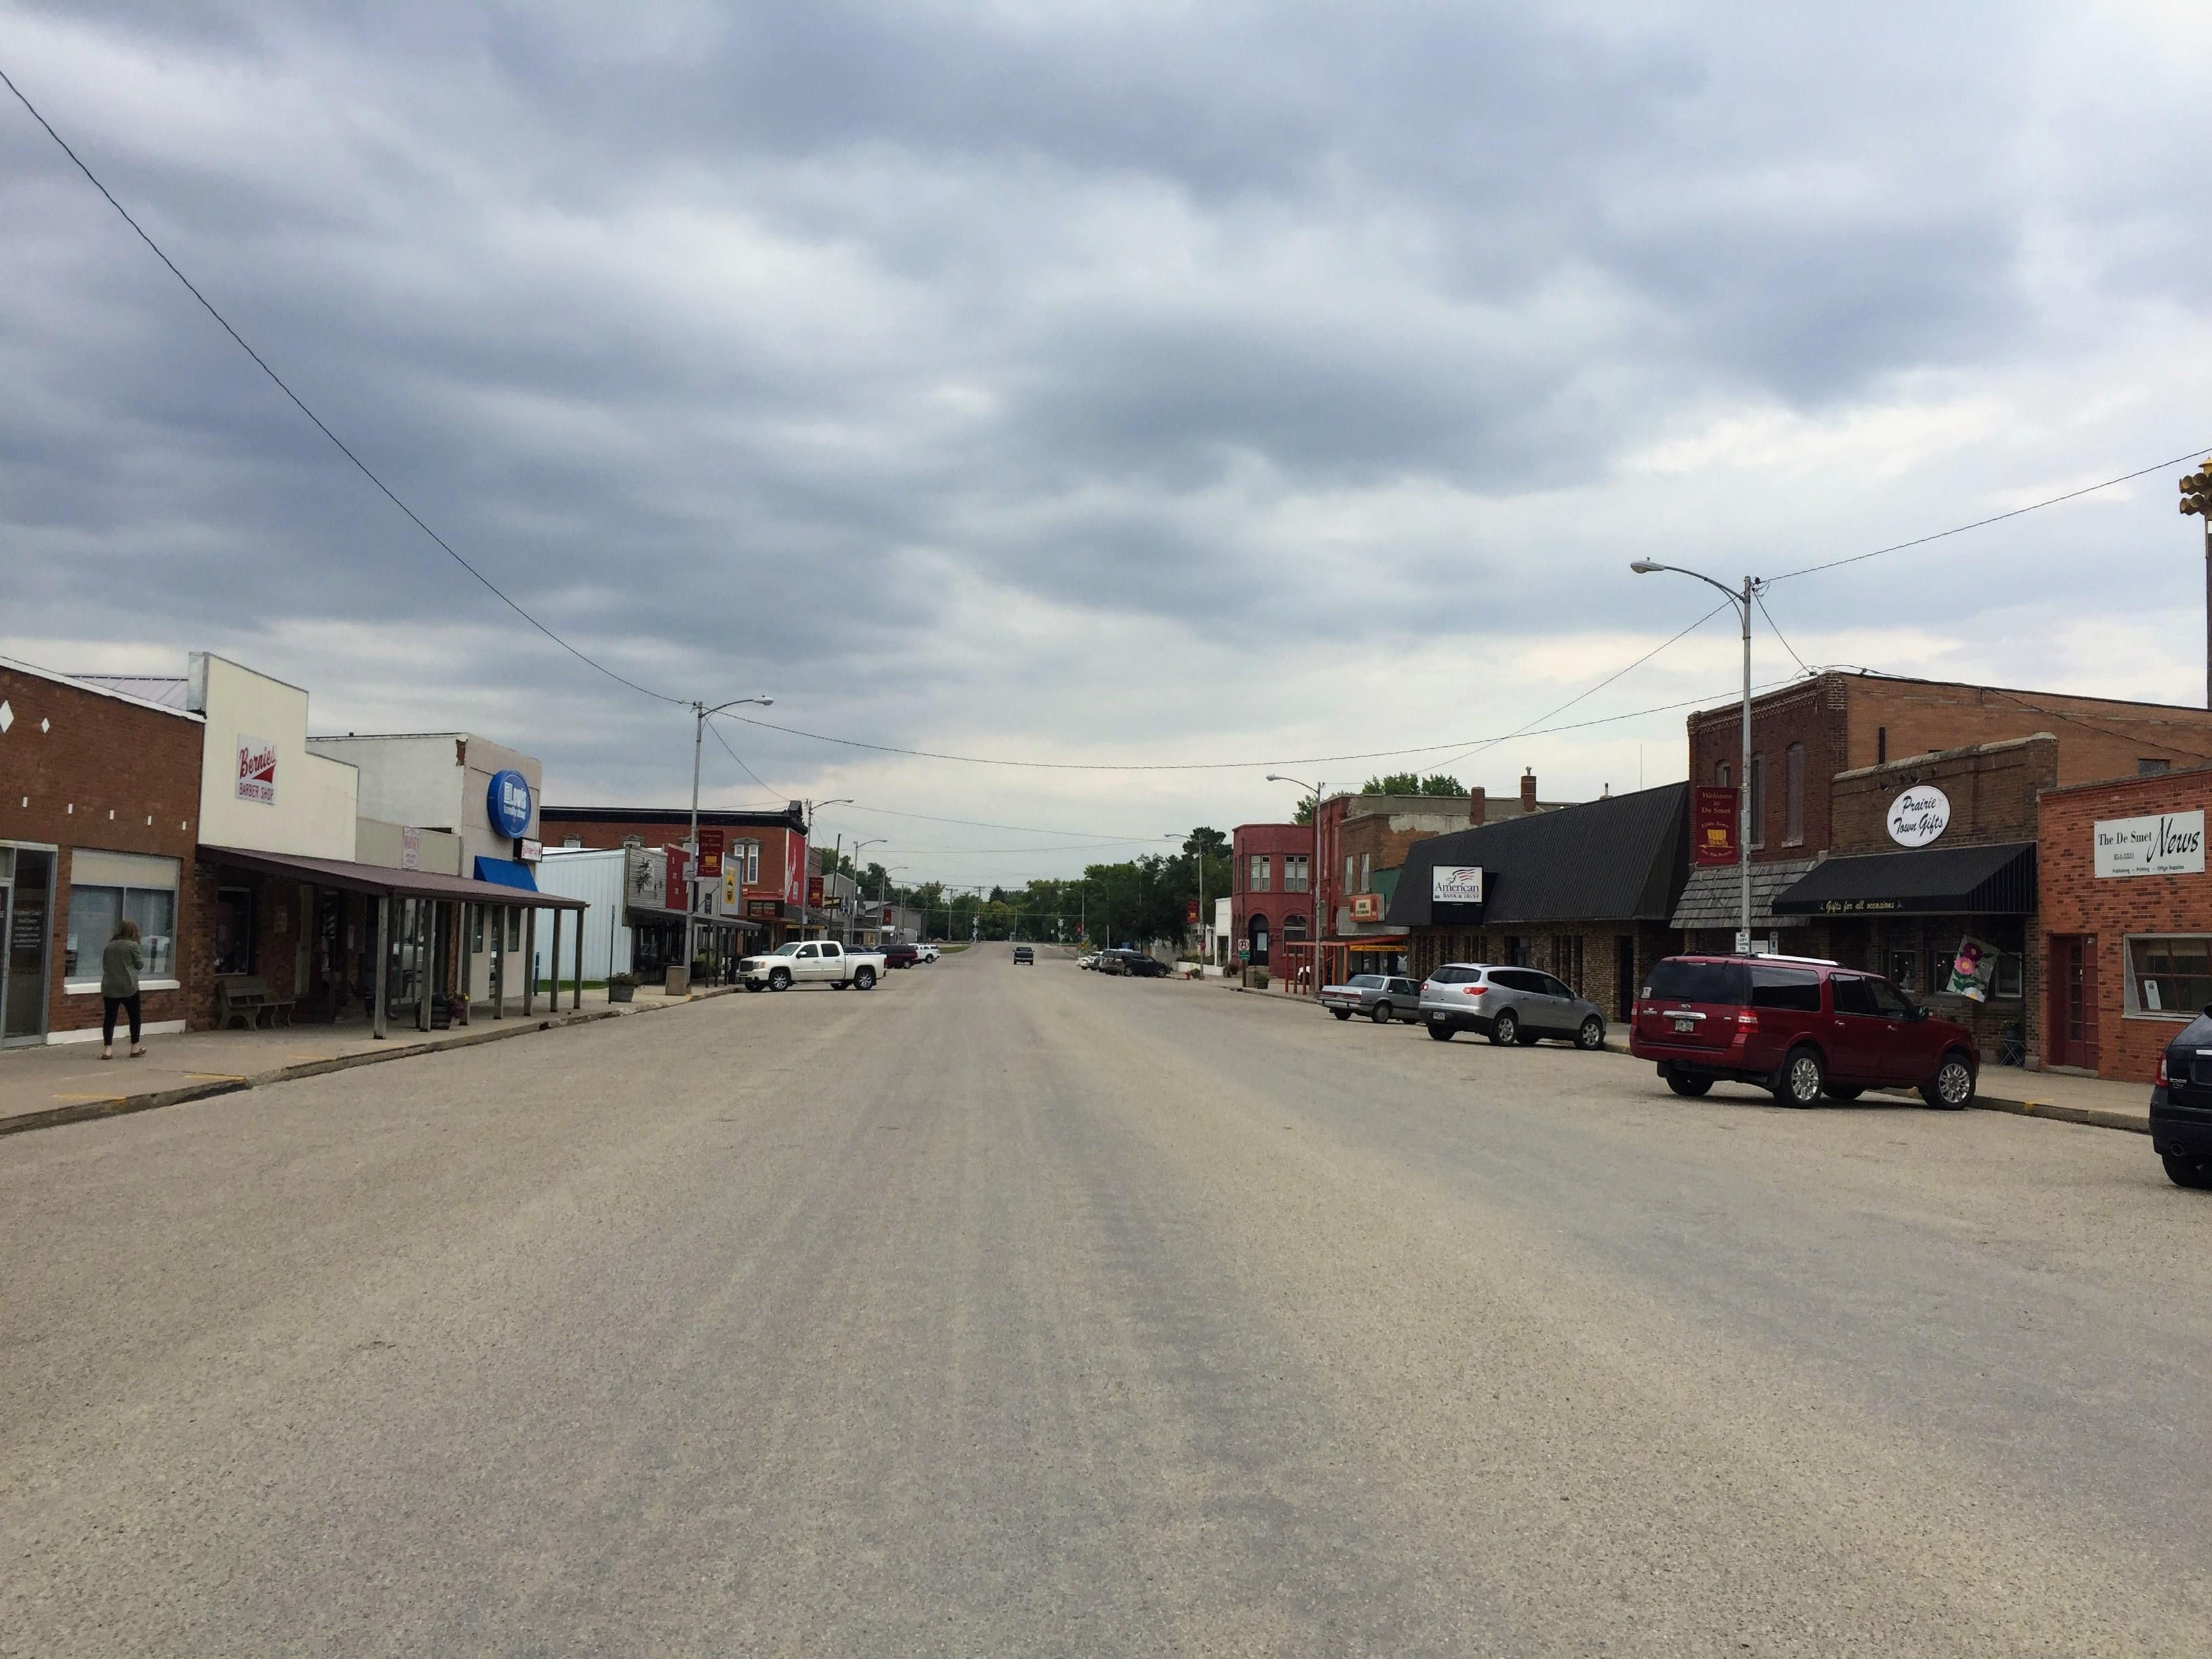 2017-09-15 LIW 12 De Smet Main Street